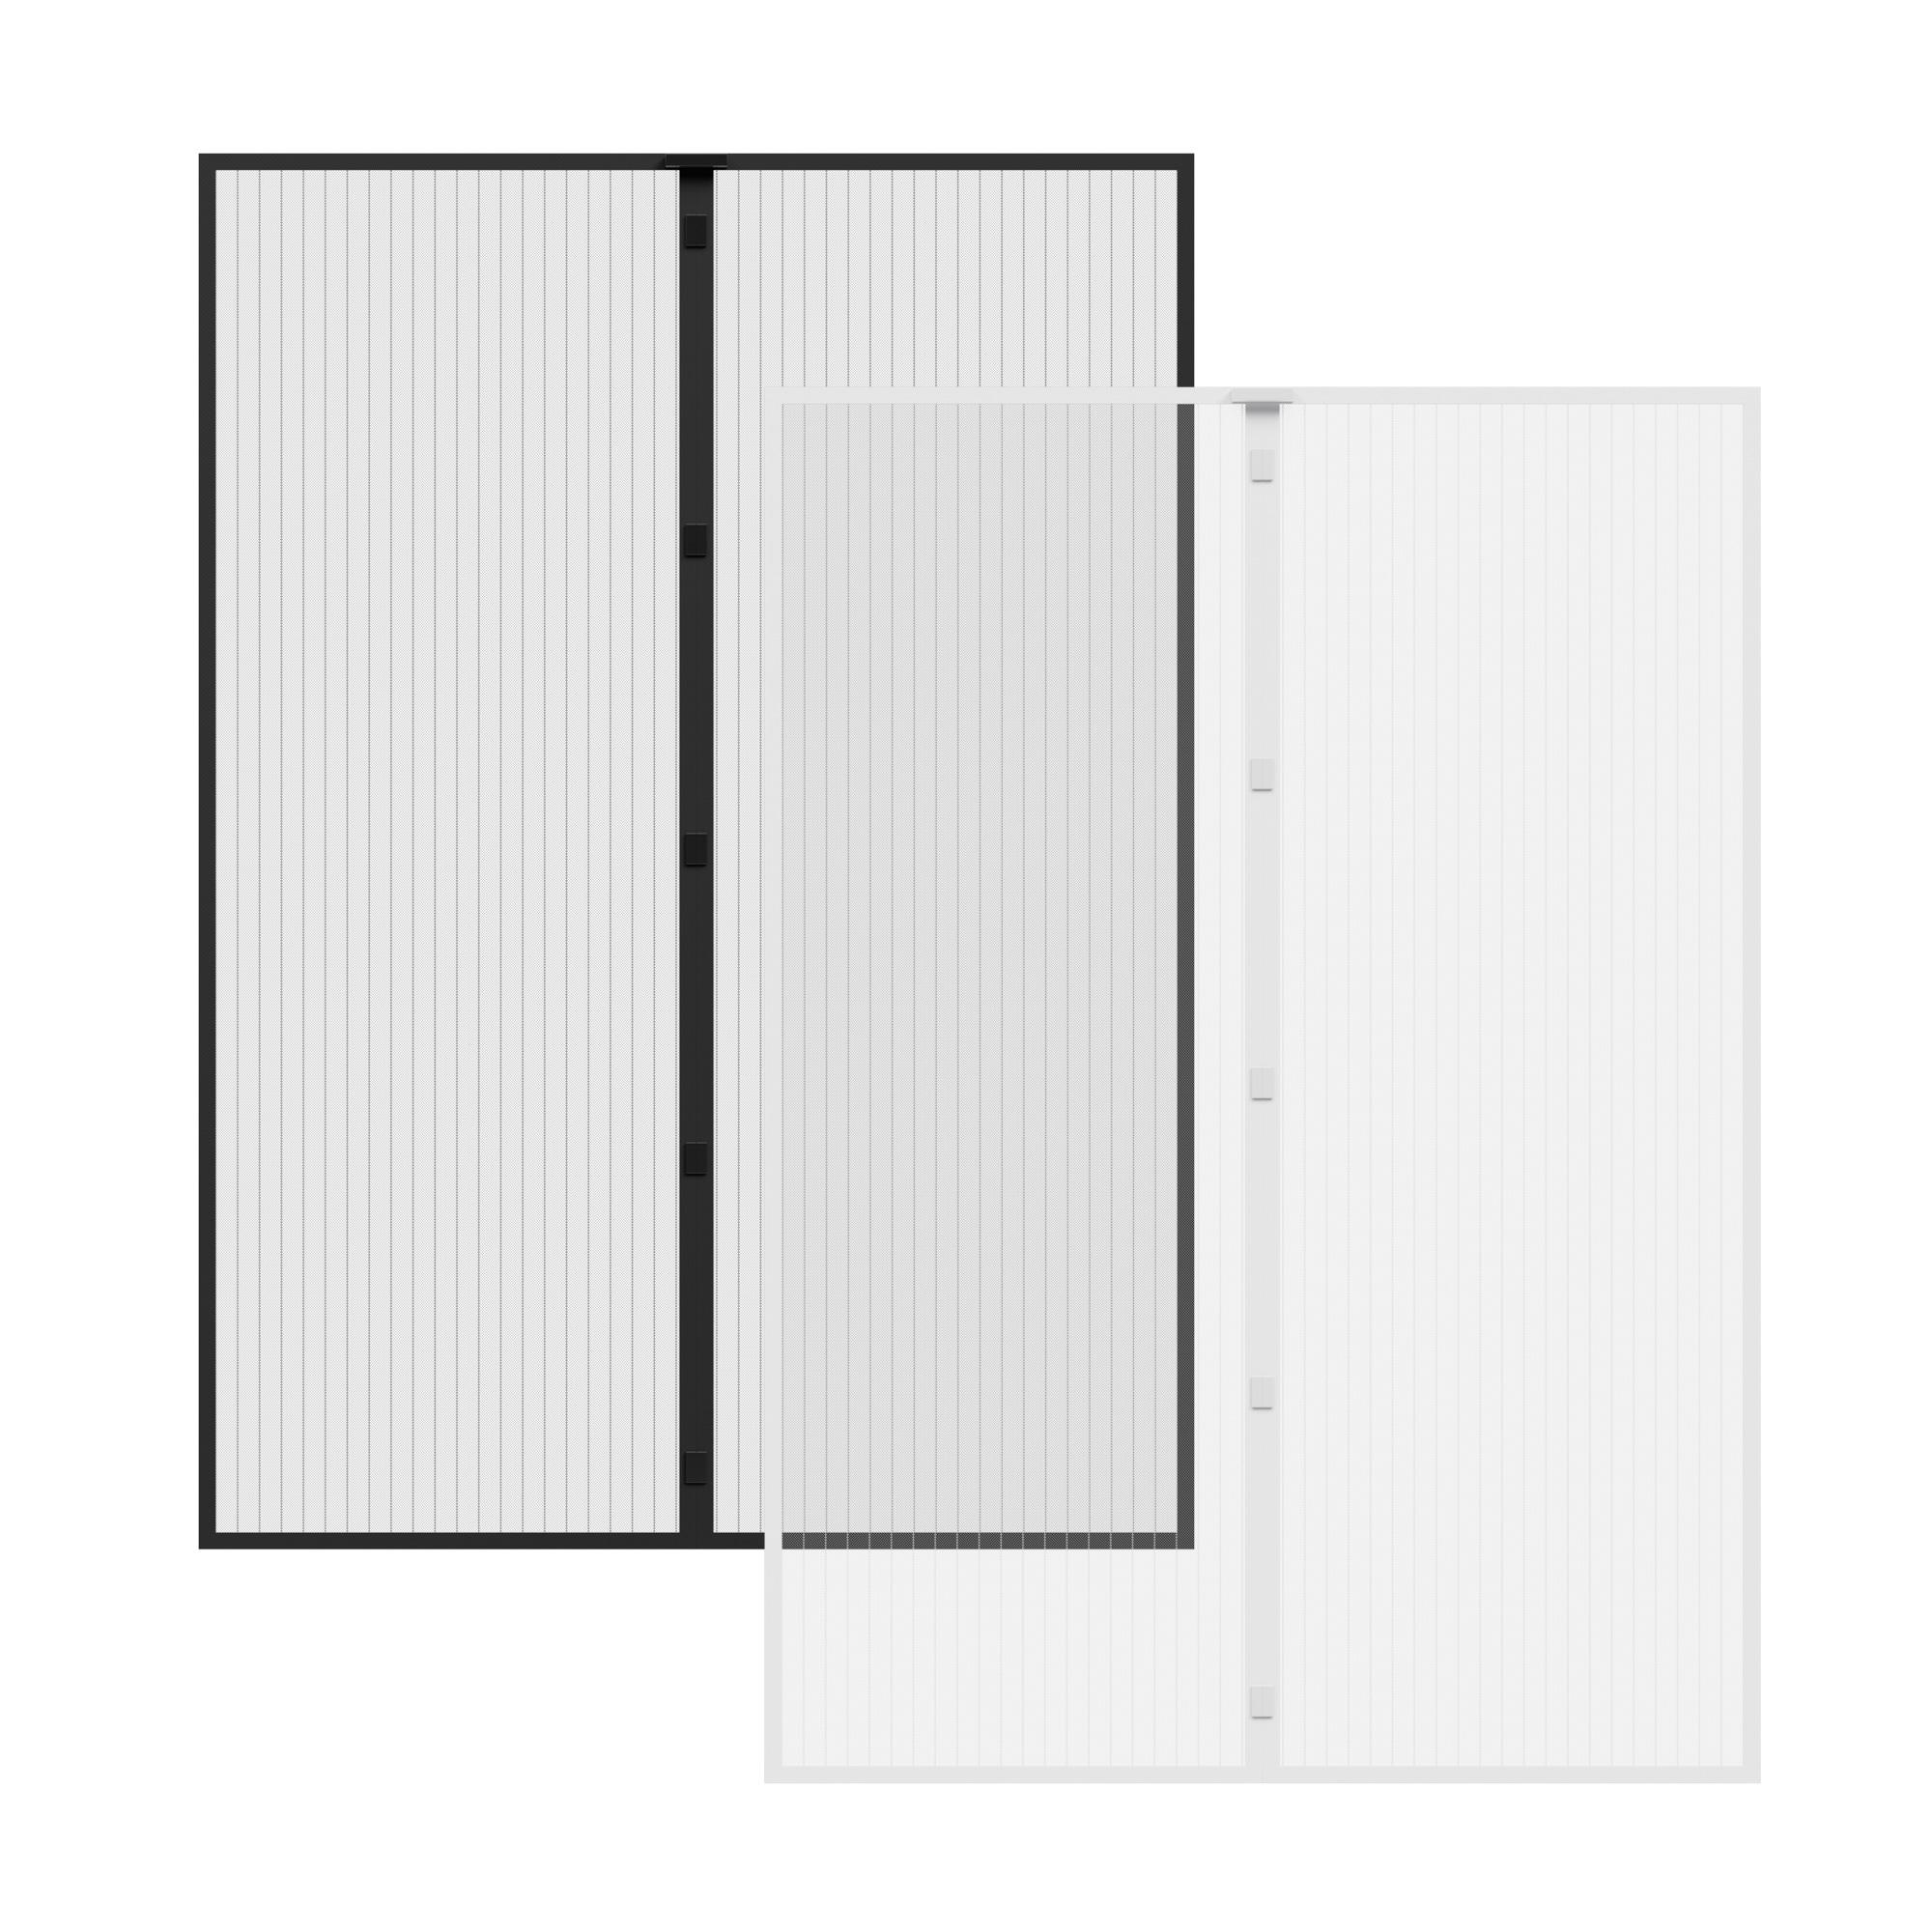 gitter fliegengitter spannrahmen aluminium fenster slimline m cke insektenschutz ebay. Black Bedroom Furniture Sets. Home Design Ideas